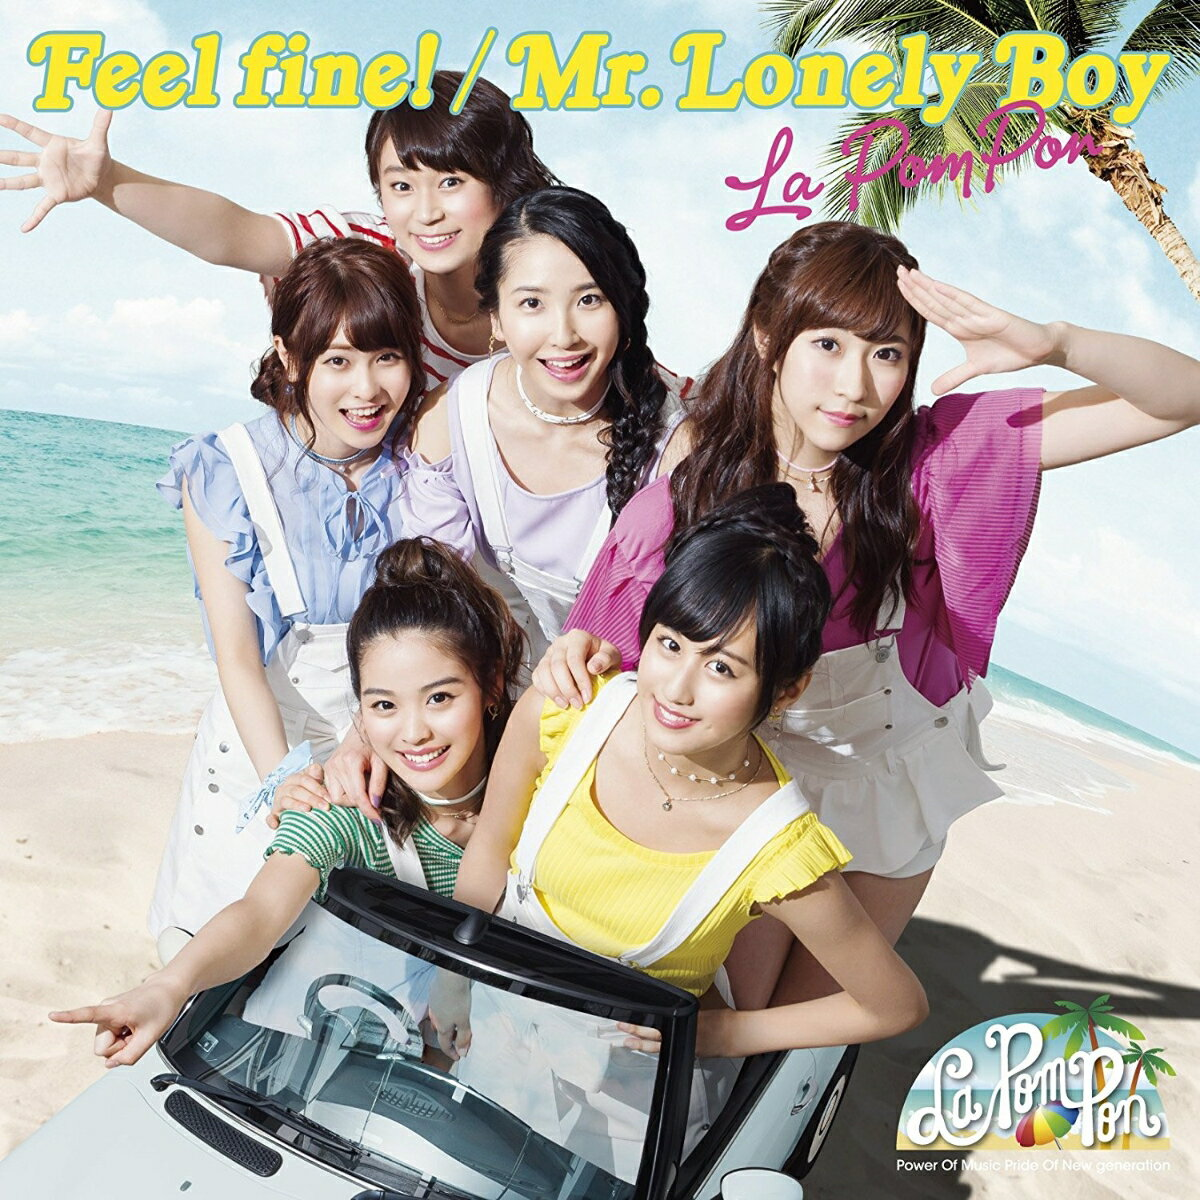 Feel fine!/ Mr.Lonely Boy (初回限定盤 CD+DVD) [ La PomPon ]